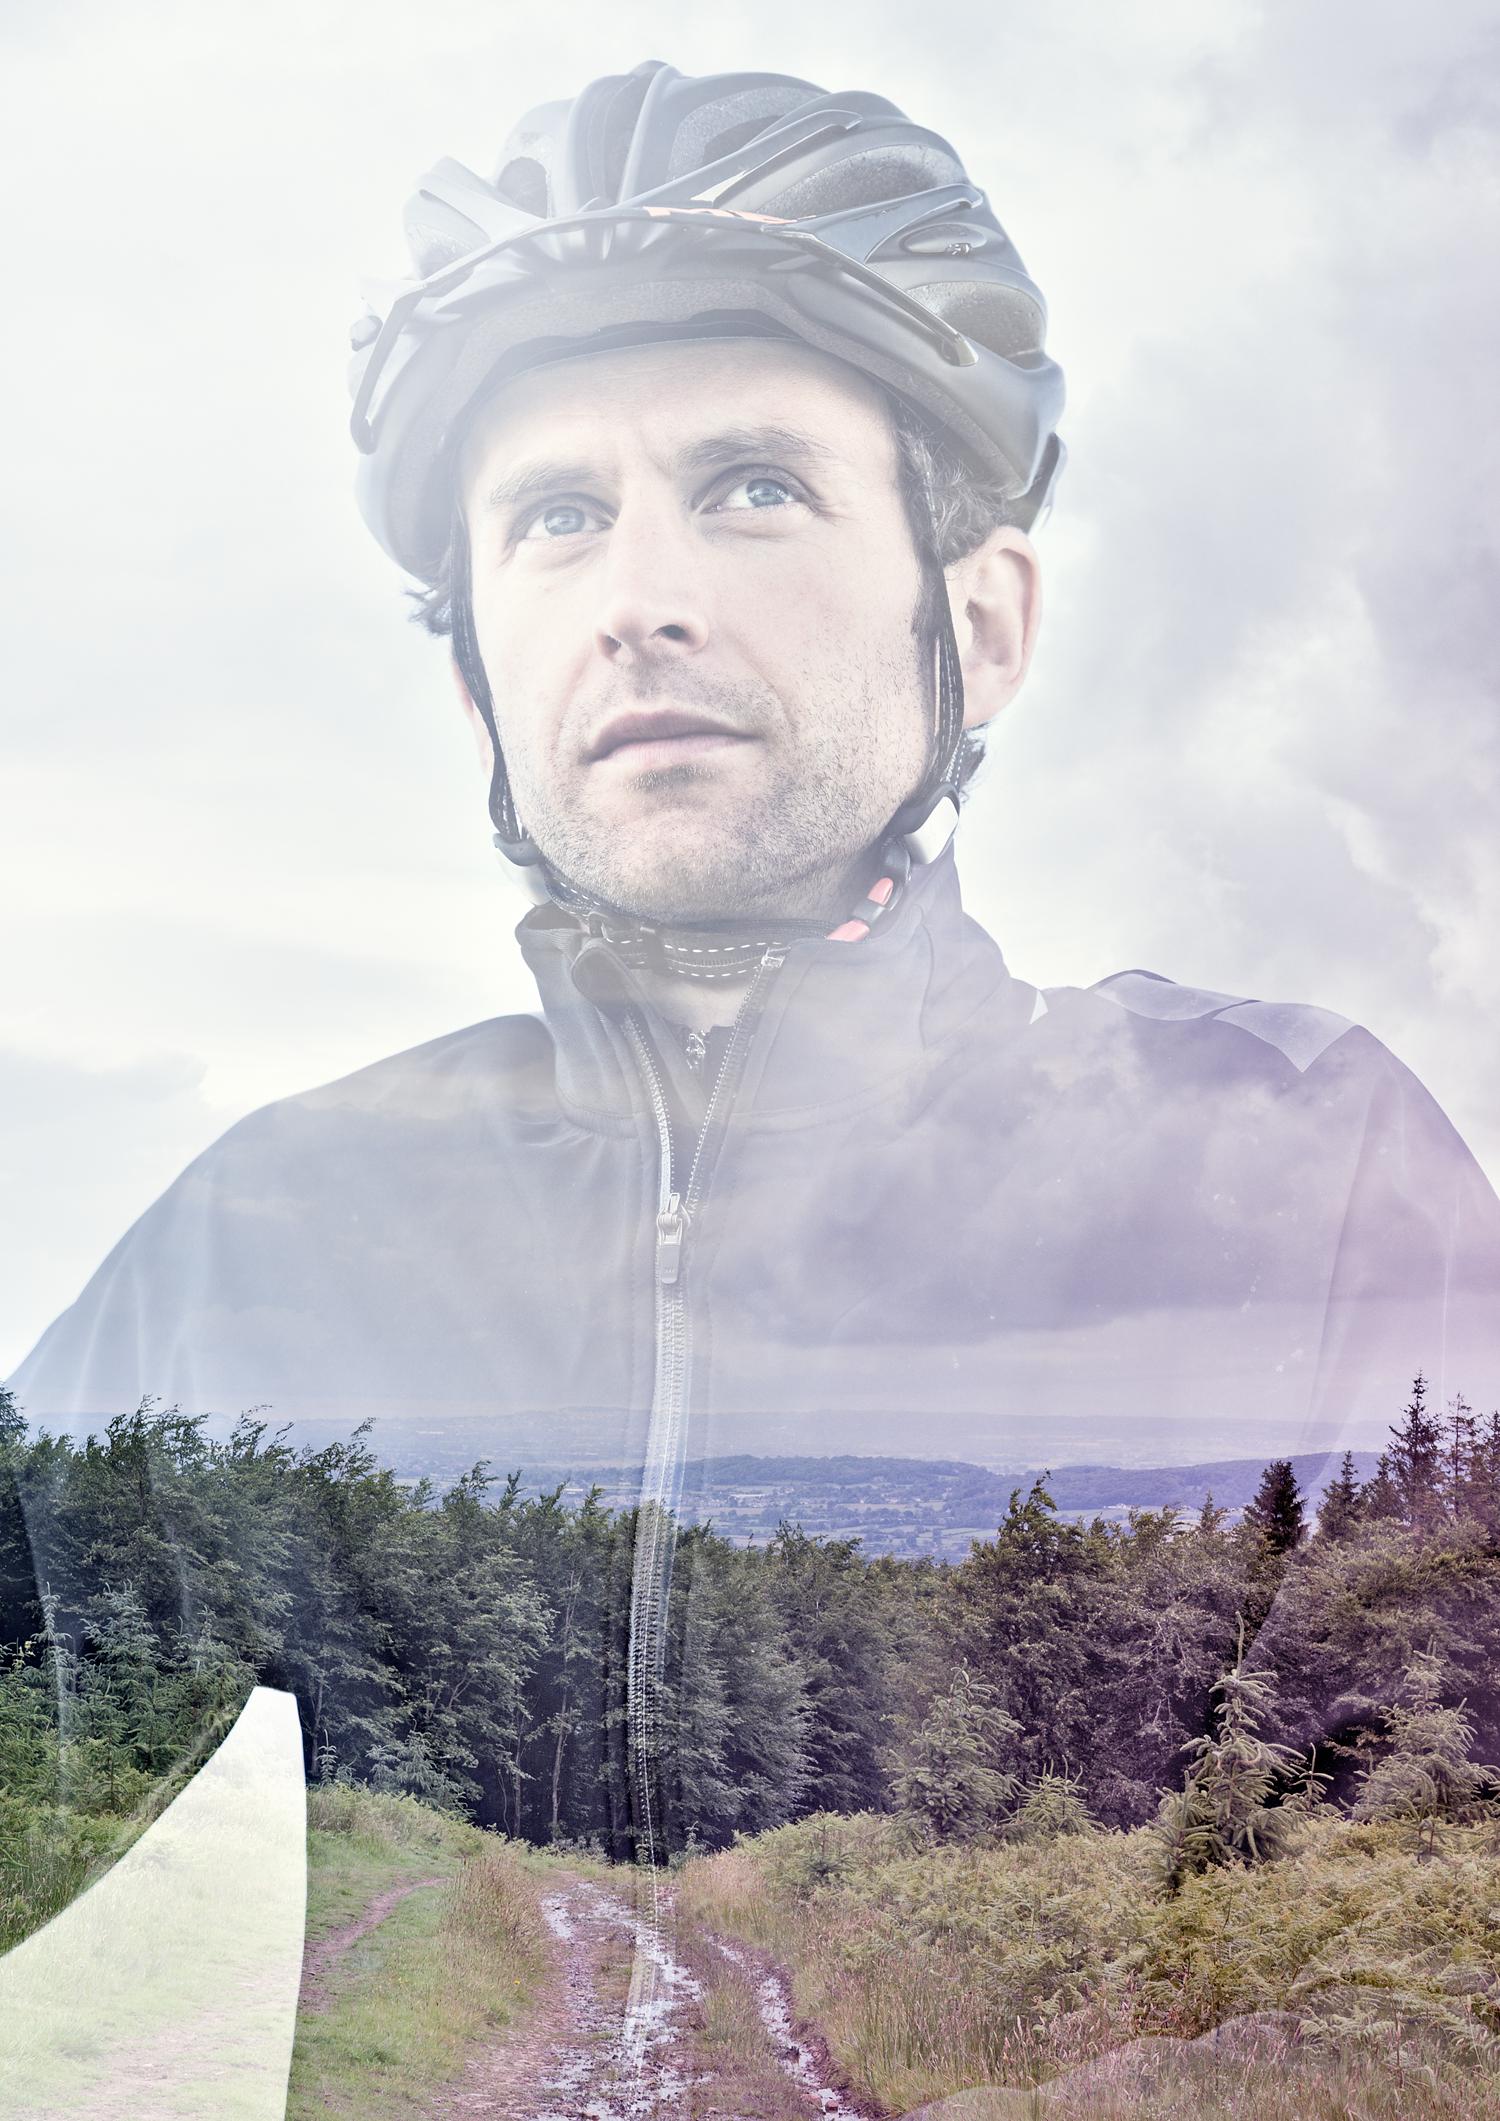 rvanderplank cycleshow 2012 oli comp v1.jpg